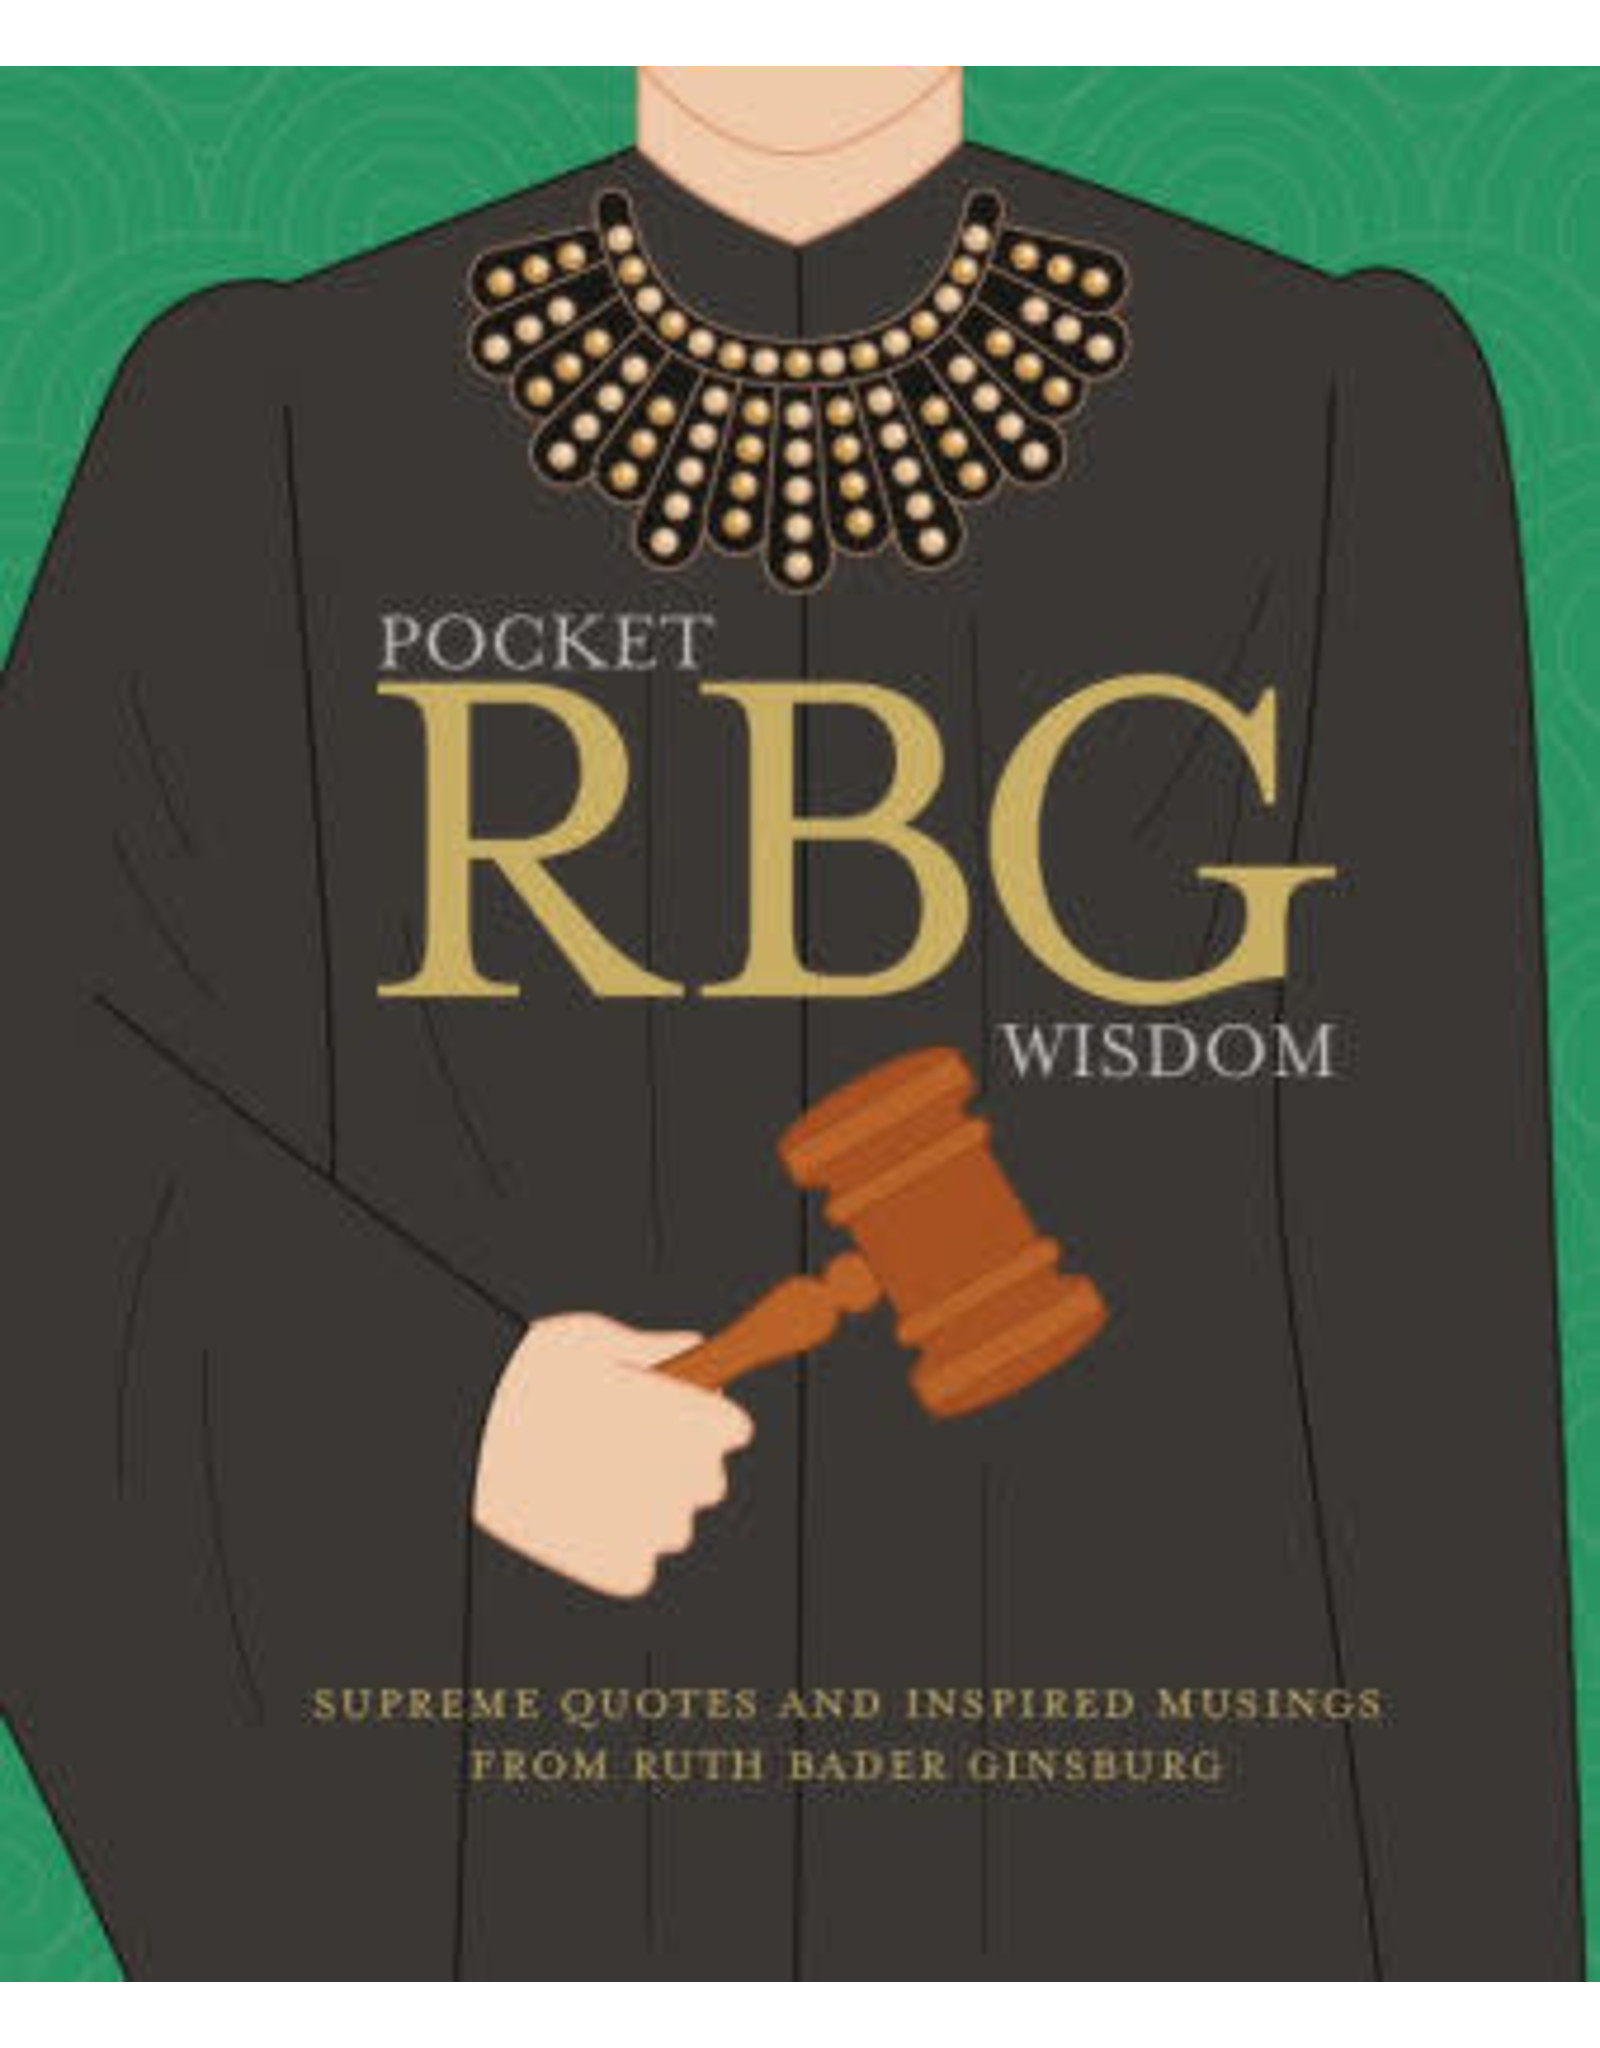 Chronicle Books Pocket RBG Wisdom